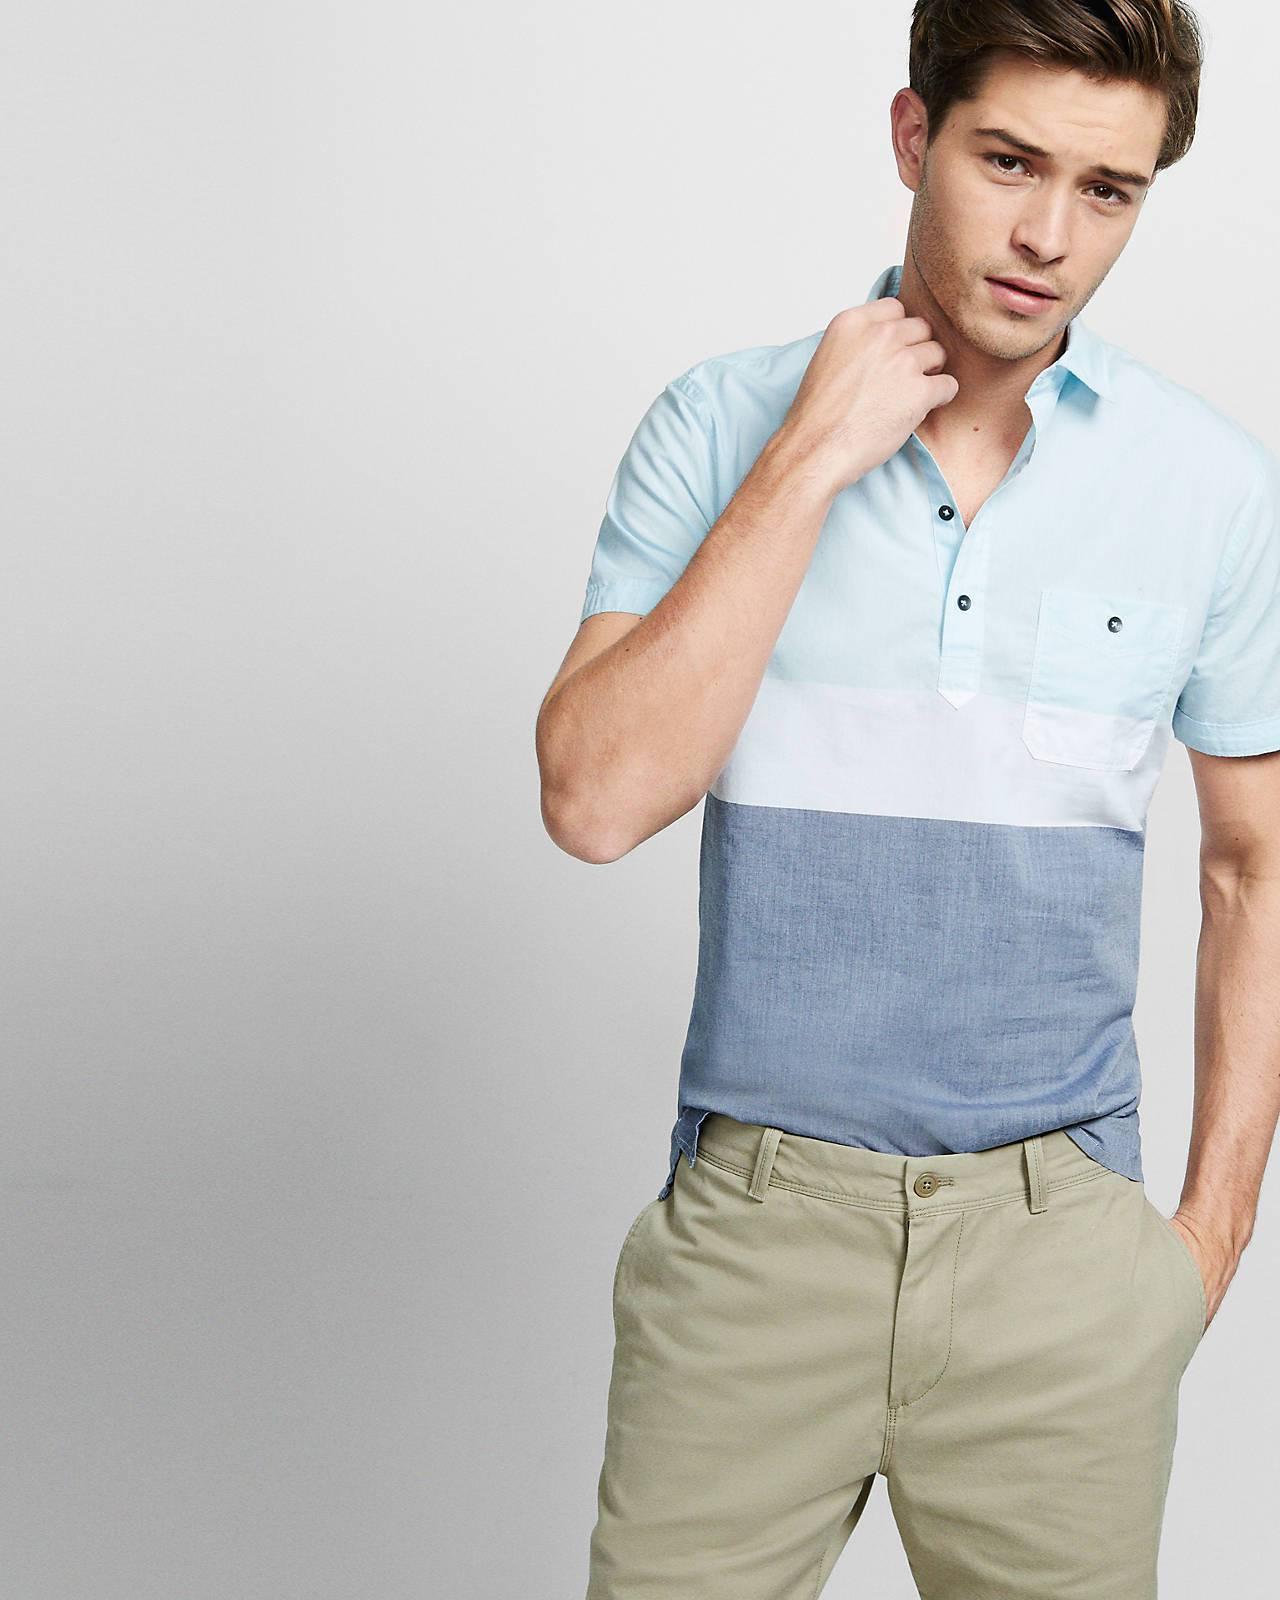 526f49e8f Grey Polo Shirt And Khaki Pants